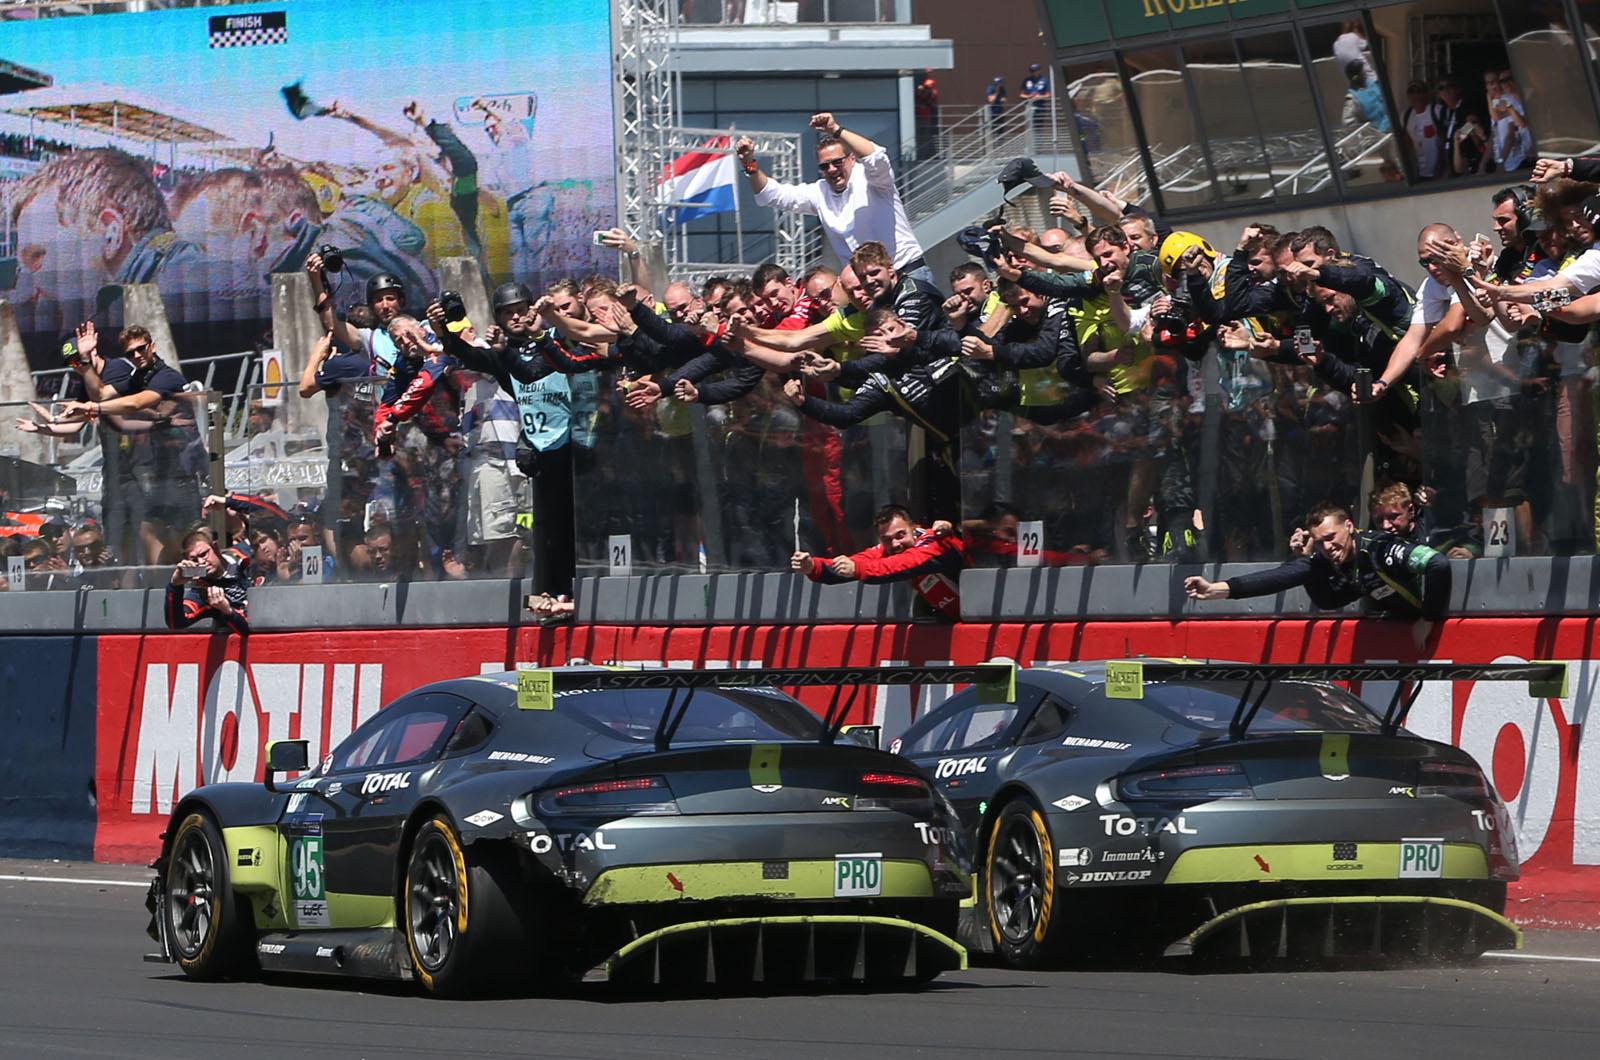 Как Aston Martin заявлял о славе Ле-Мана в последнем триллере